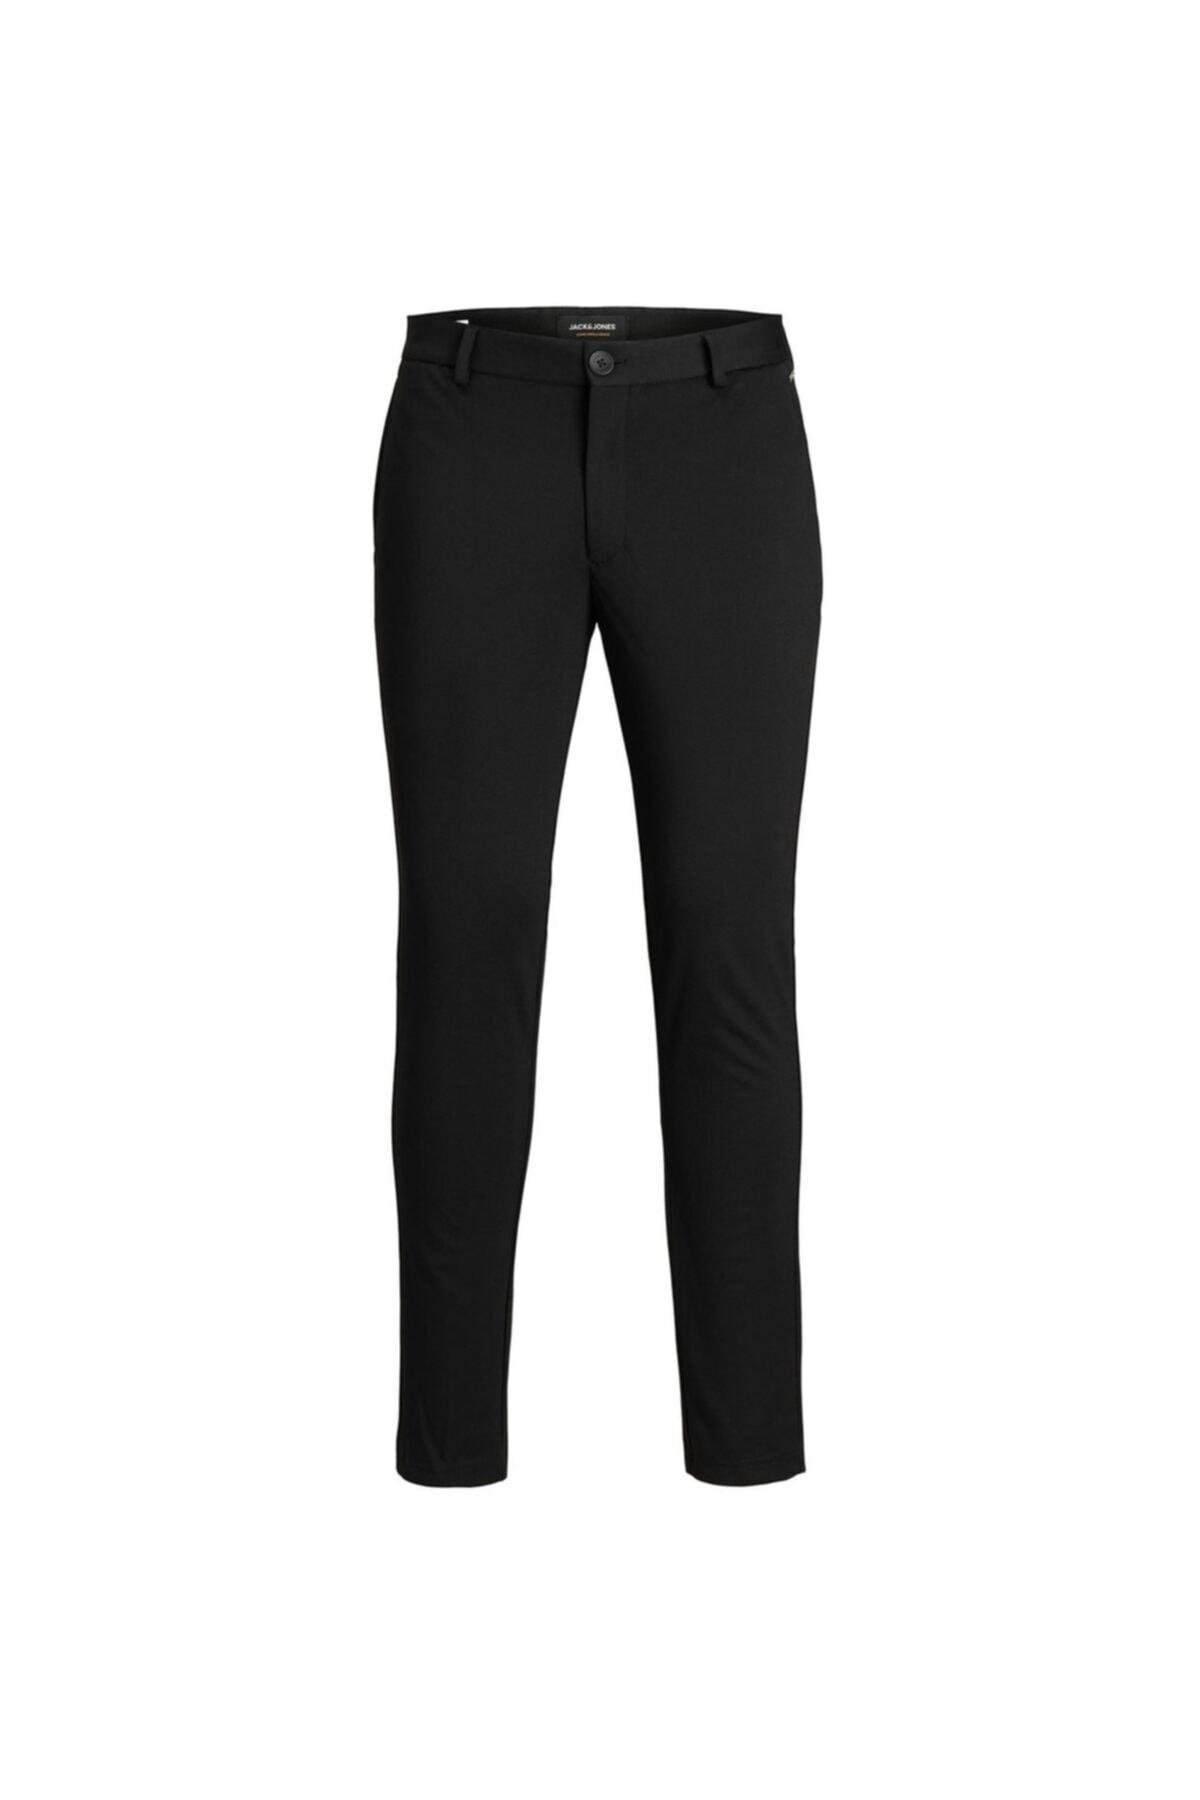 Jack & Jones Erkek Siyah Dar Paça Pantolon 12173623-b 2